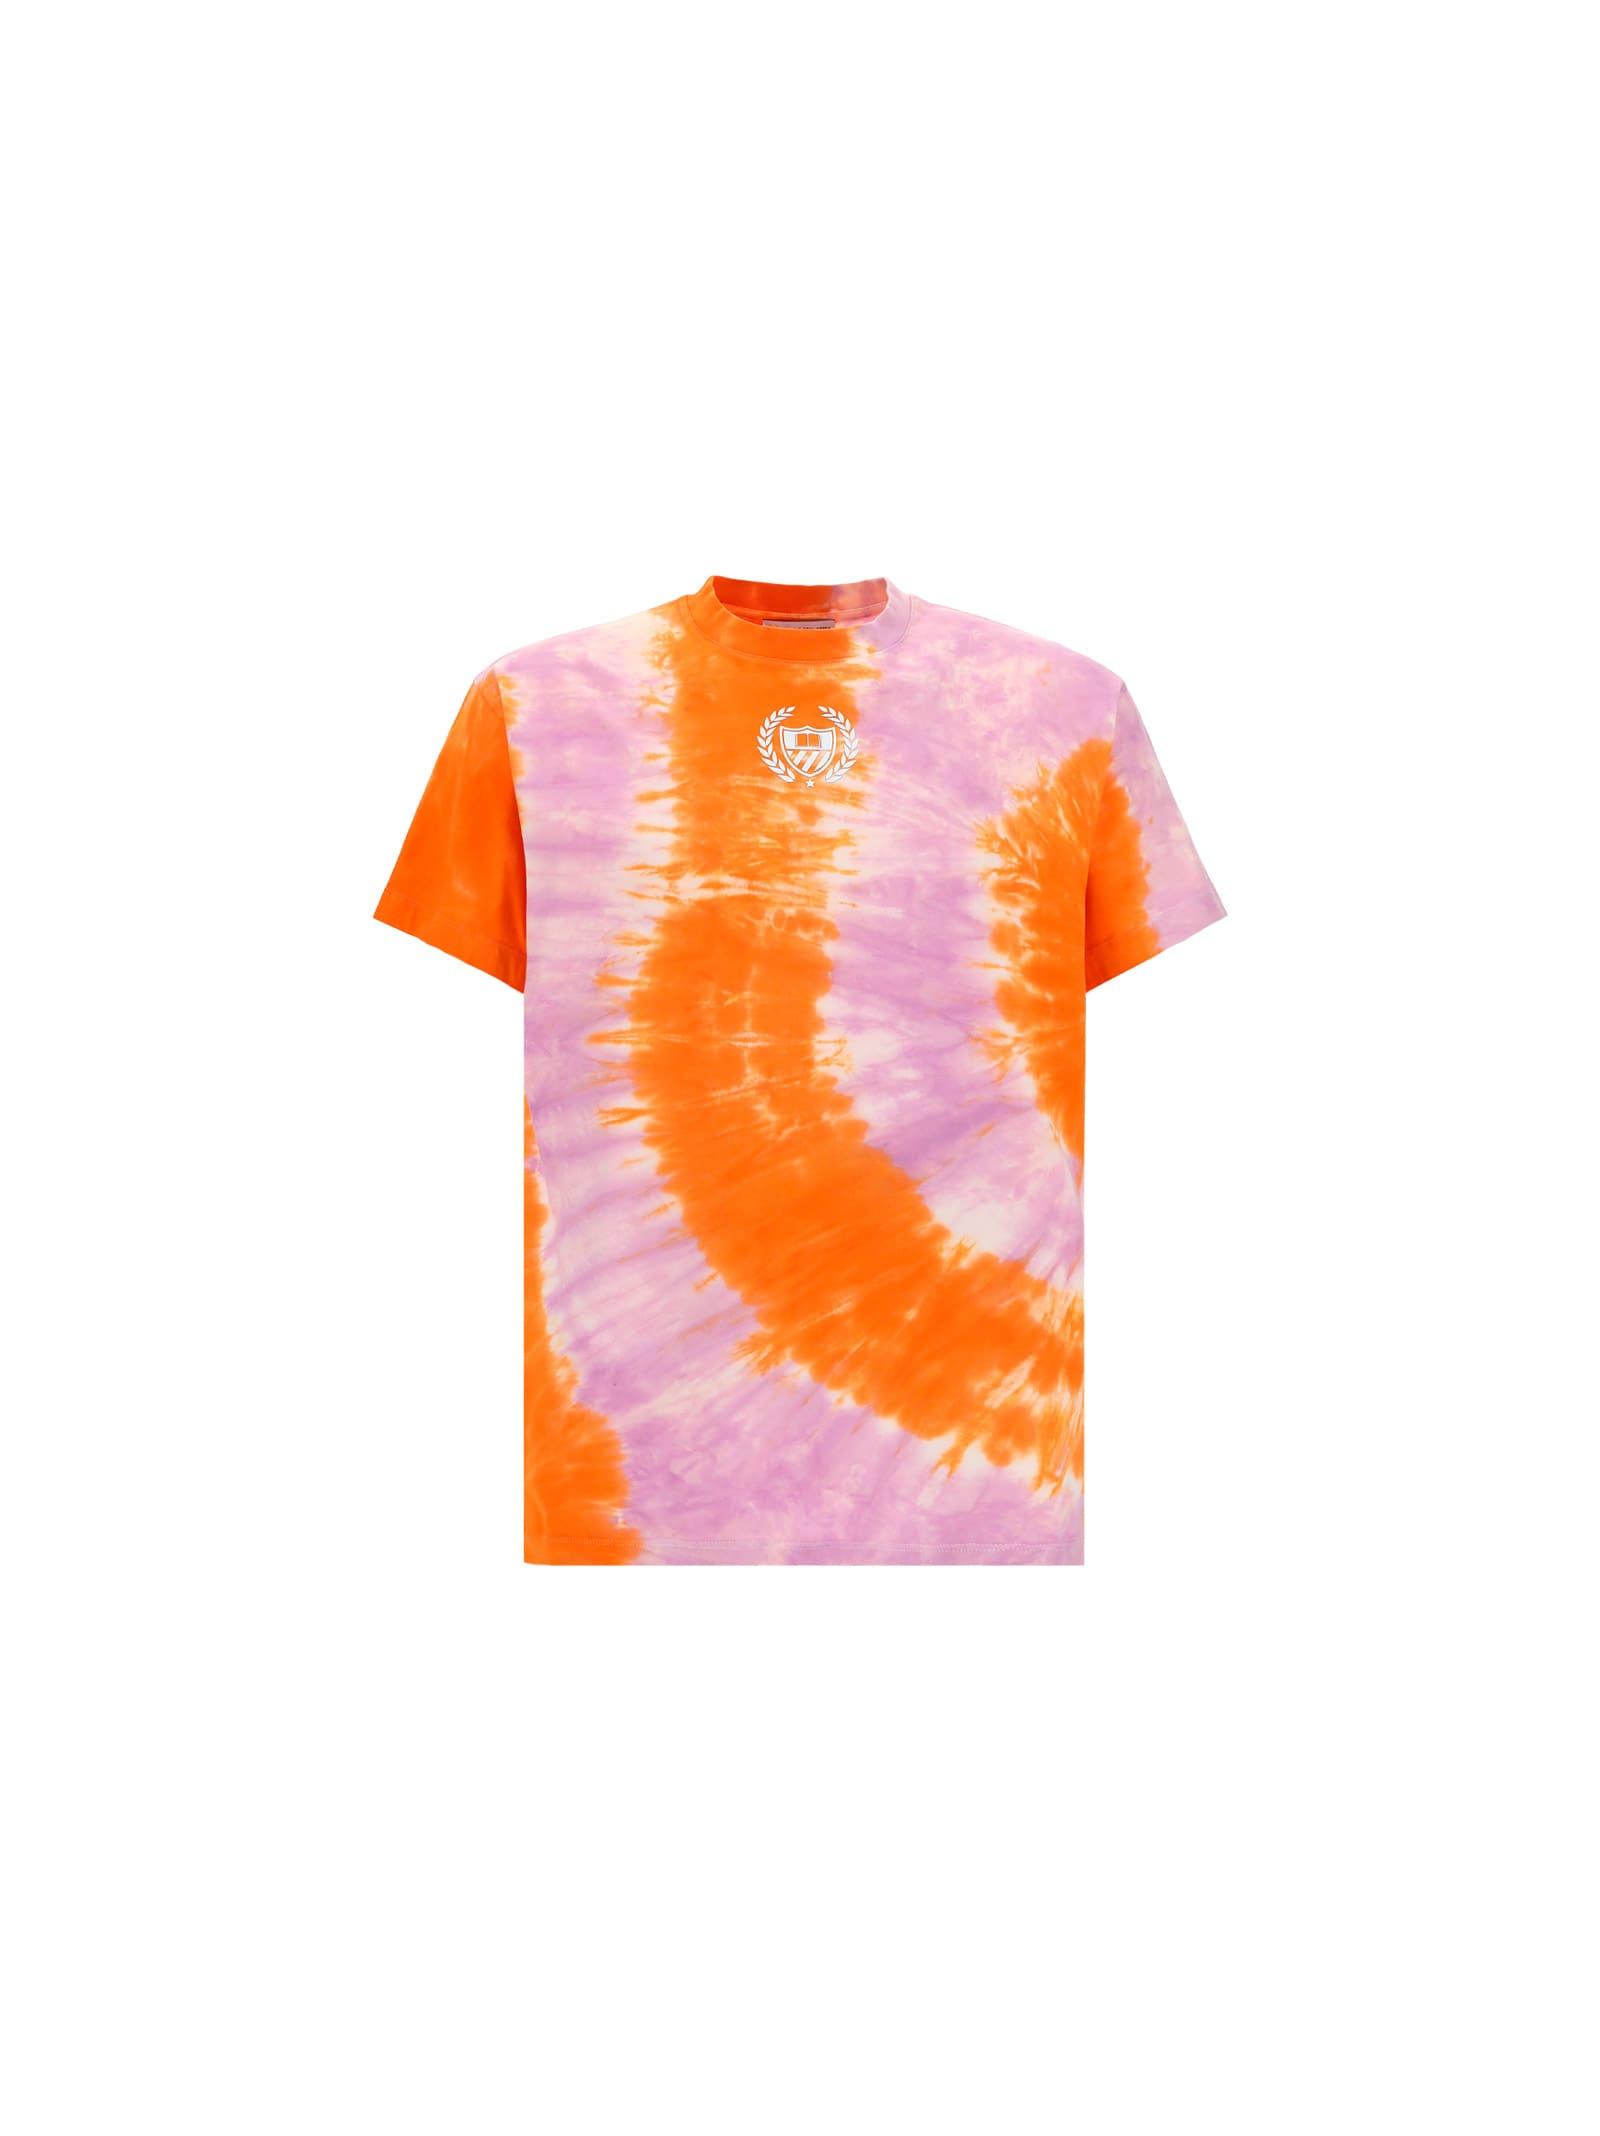 T-shirt By Bel-air Athletics